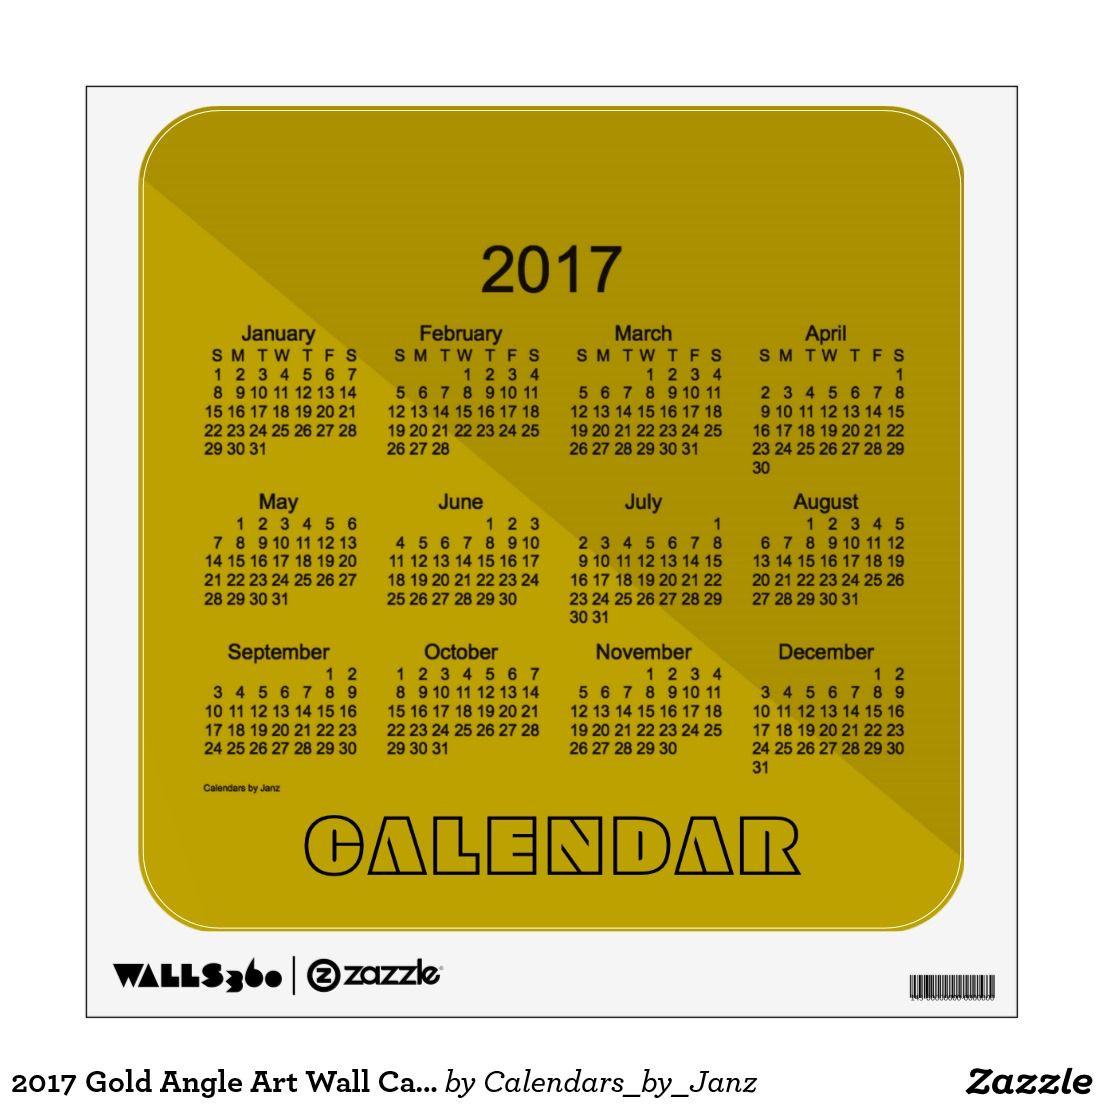 2017 Gold Angle Art Wall Calendar by Janz Wall Sticker | RYB ...